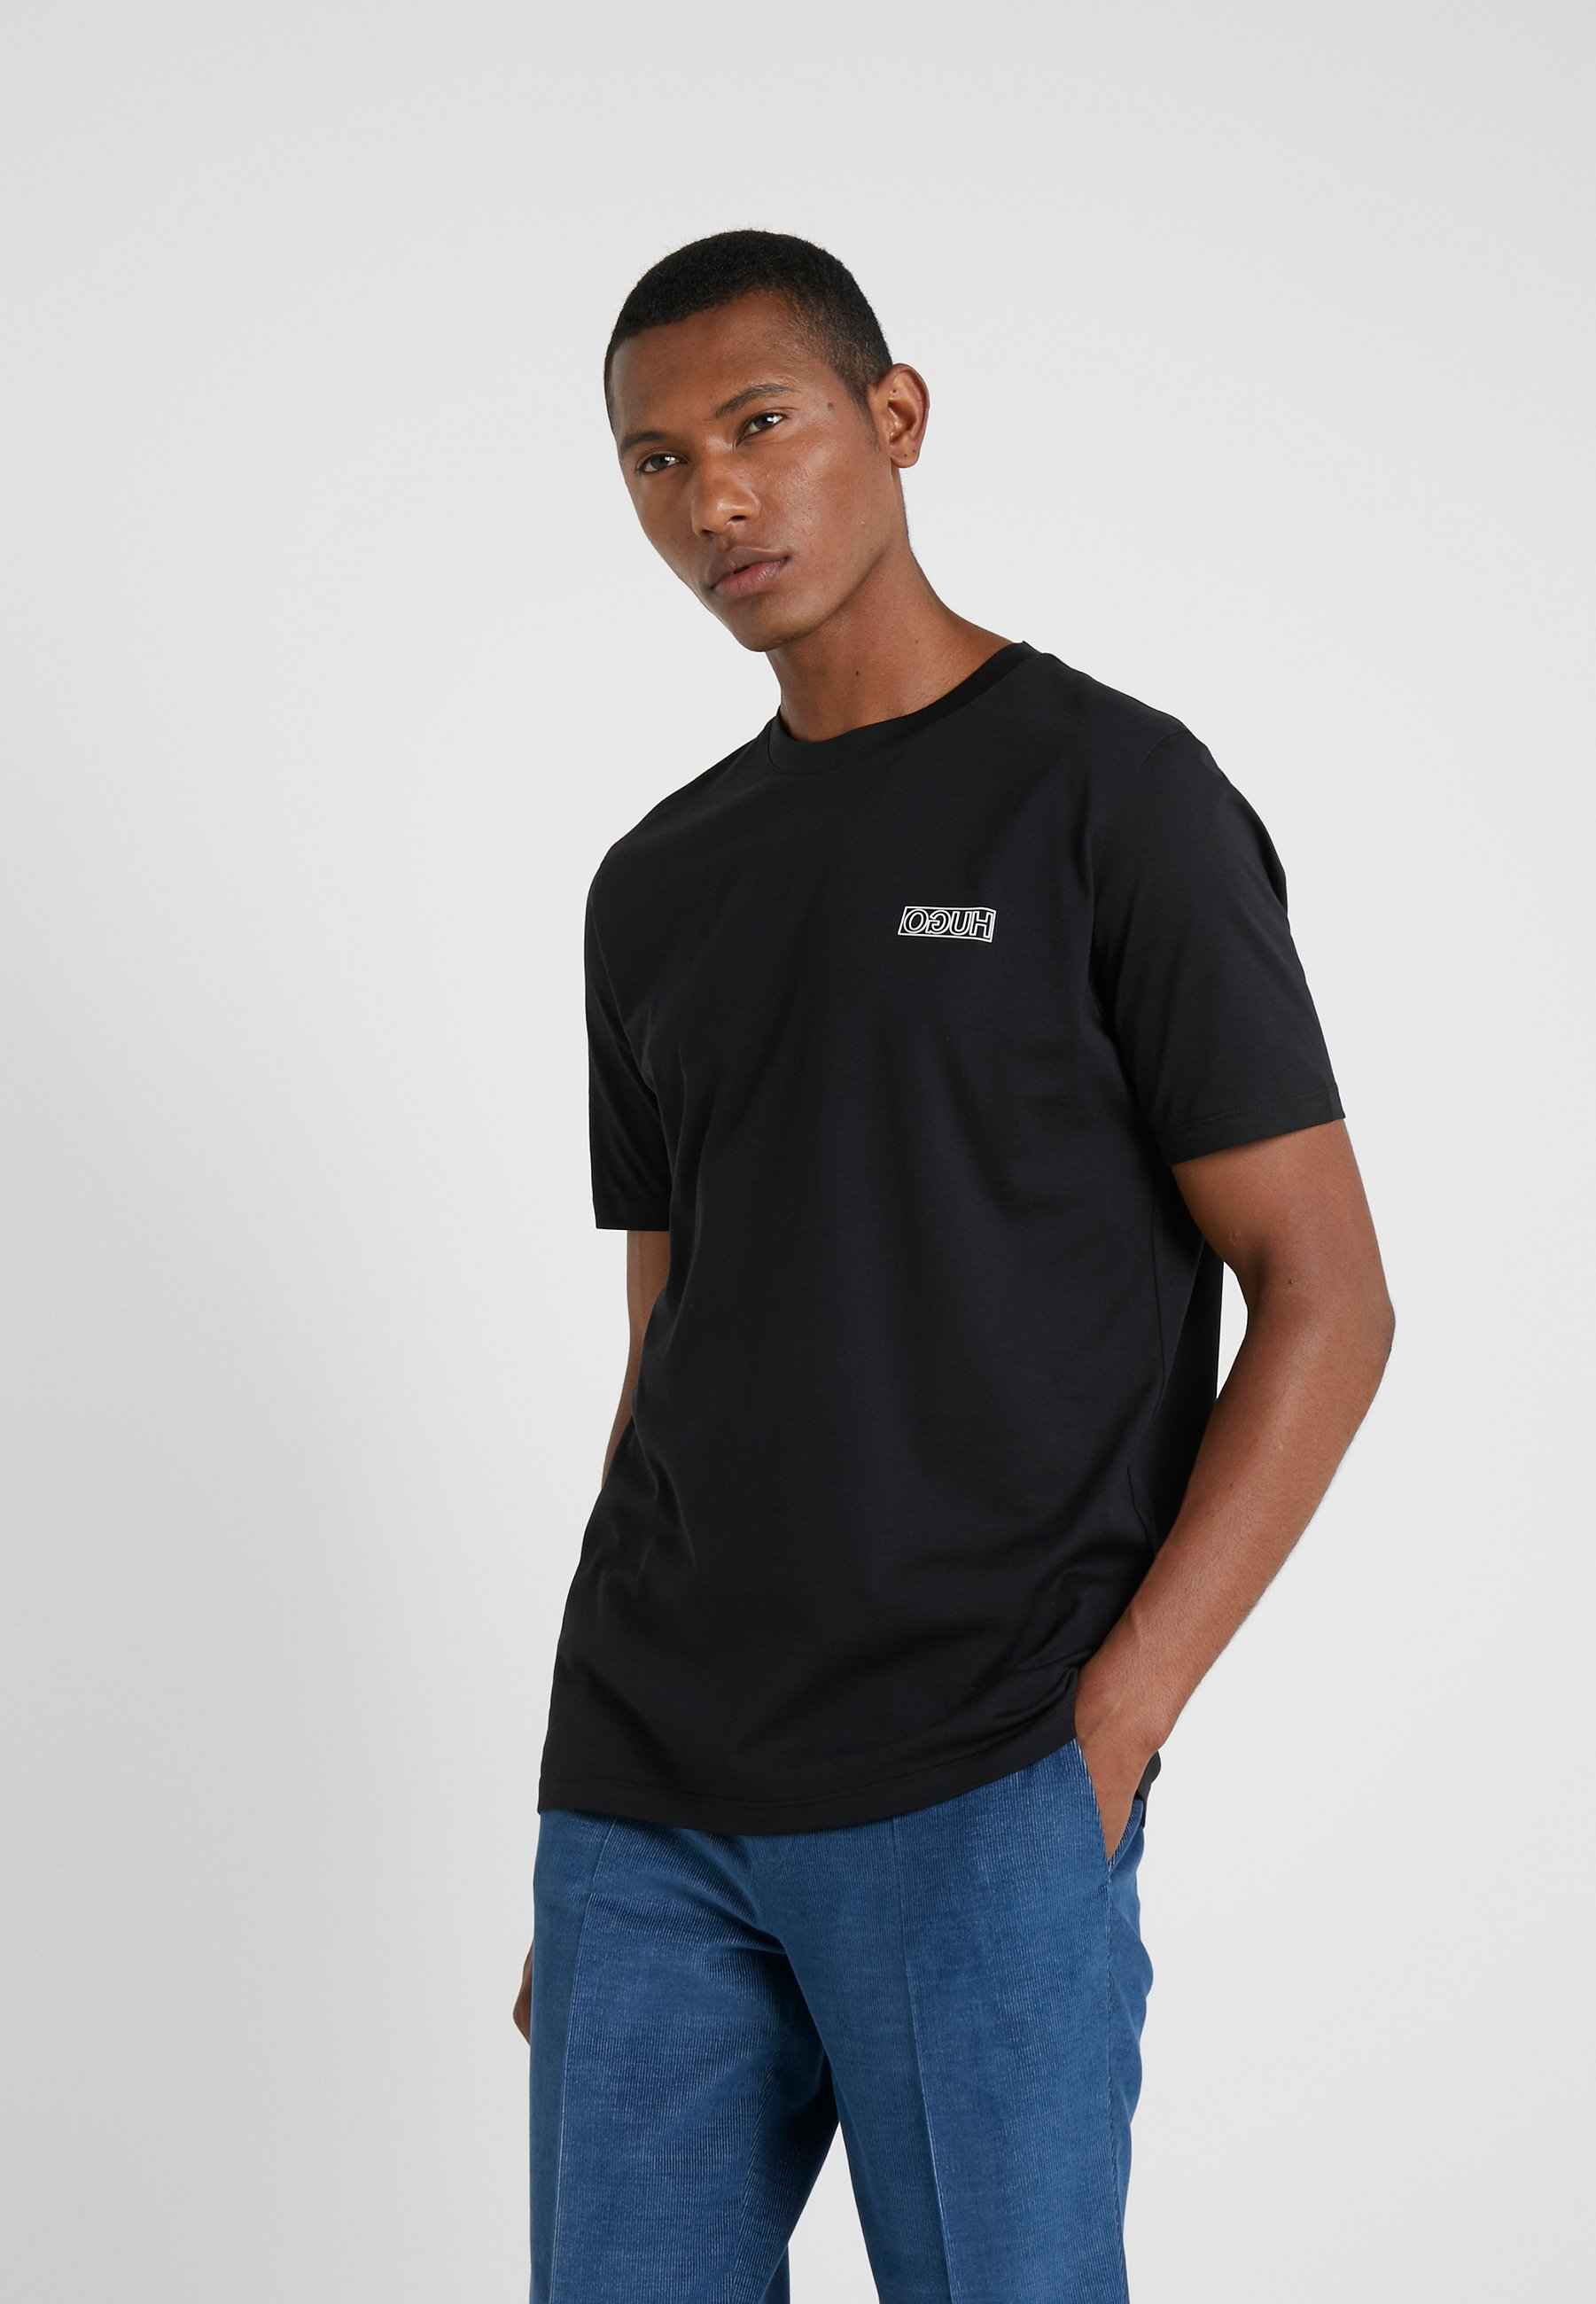 Black Hugo Basique Black shirt Basique Hugo DurnedT Hugo shirt DurnedT 80NnOPXwkZ